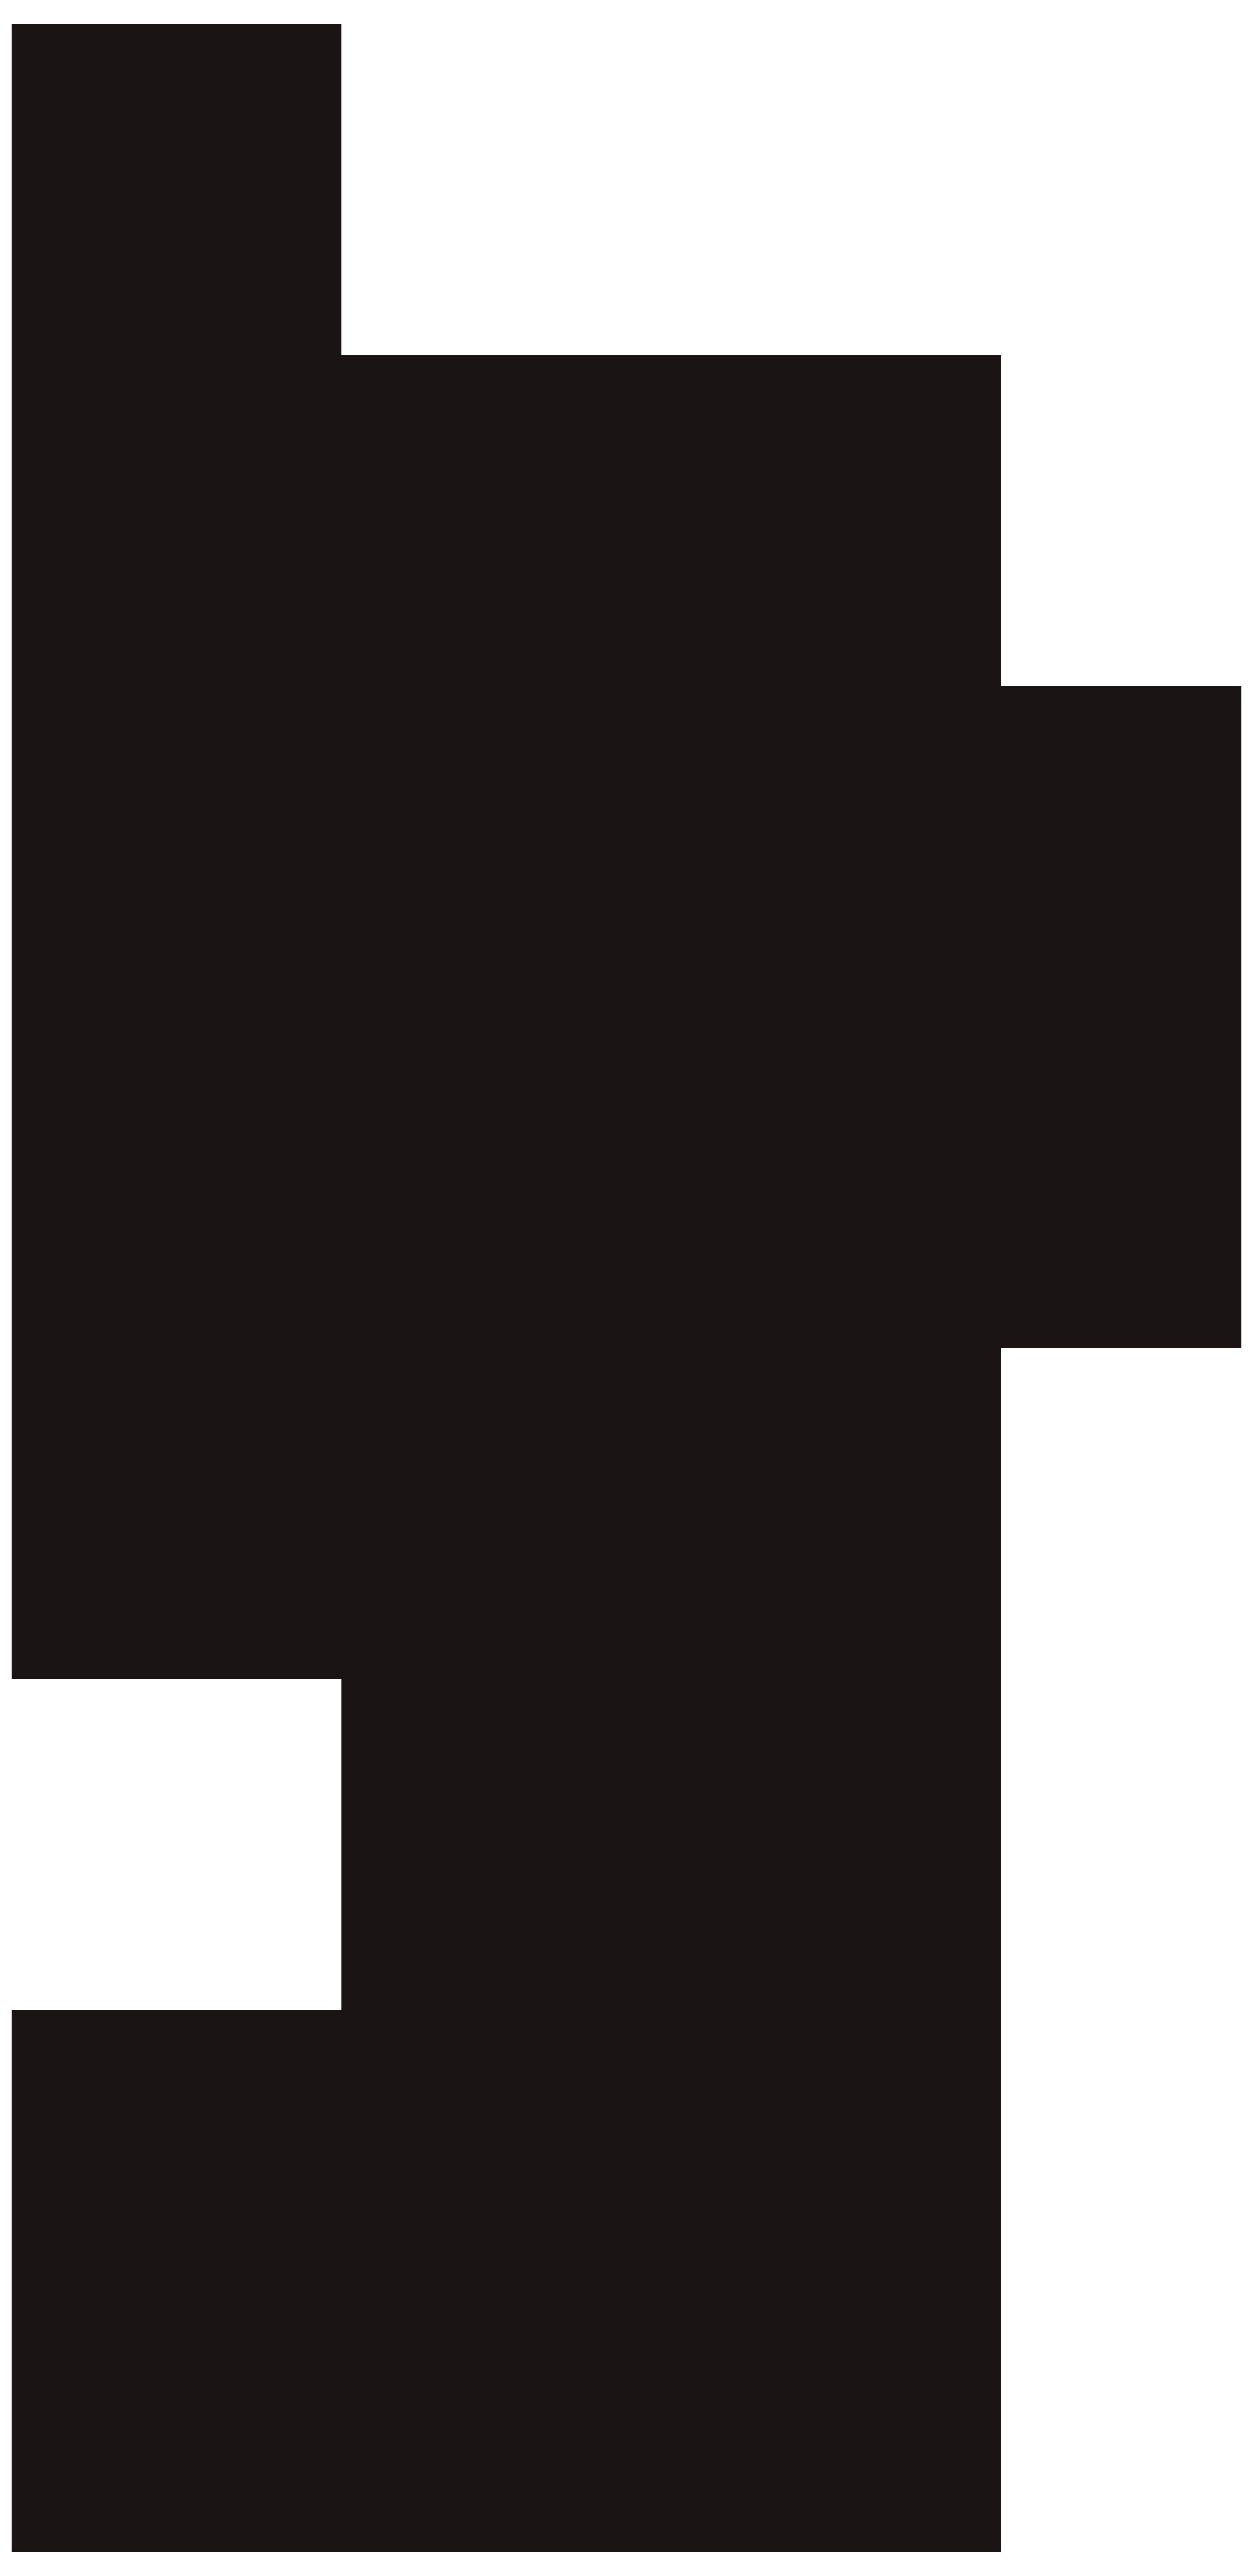 Ballerina silhouette png clip. Tutu clipart ballet tutu